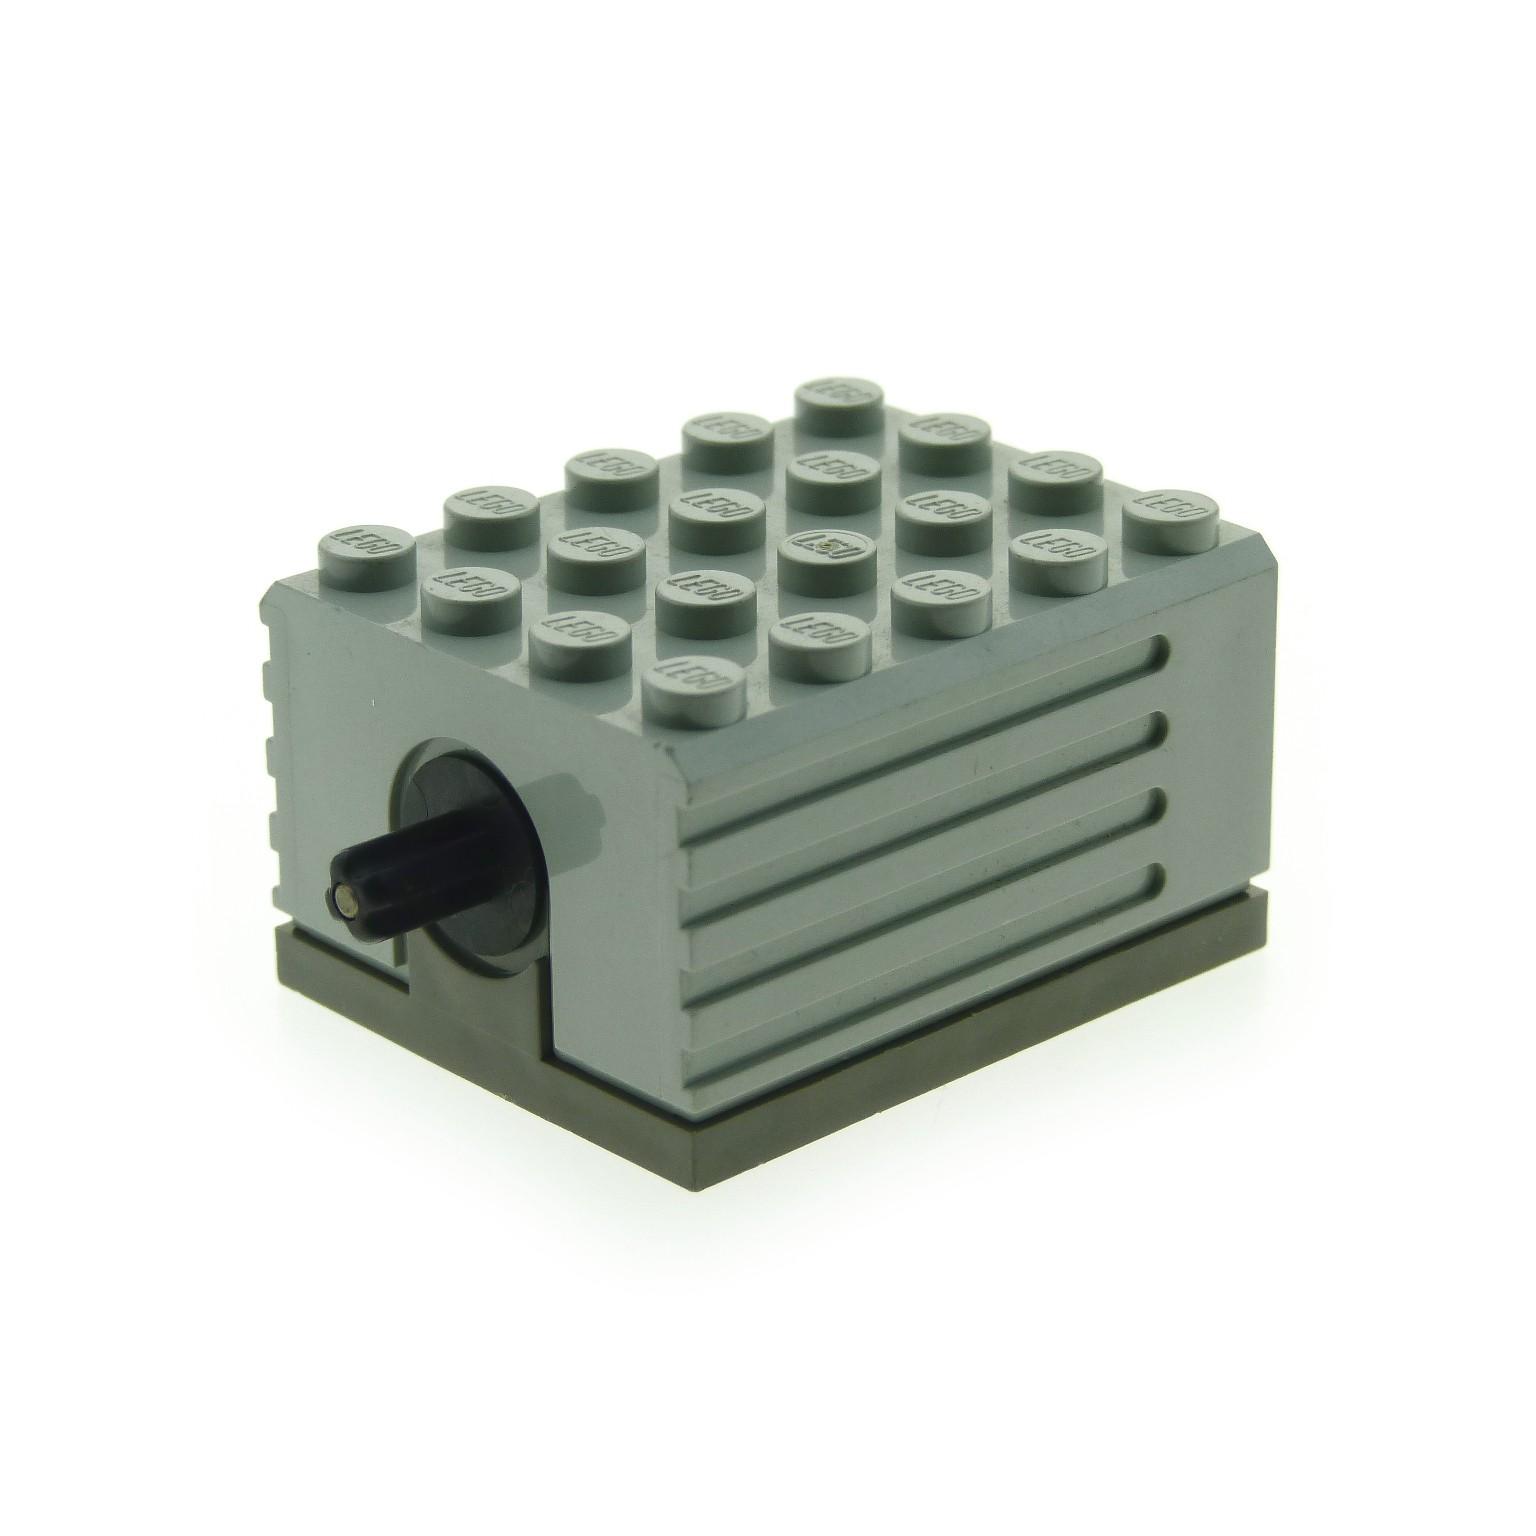 1 X Lego Brick Light Gray Electric Motor 9v 5 X 4 X 2 13 For Set